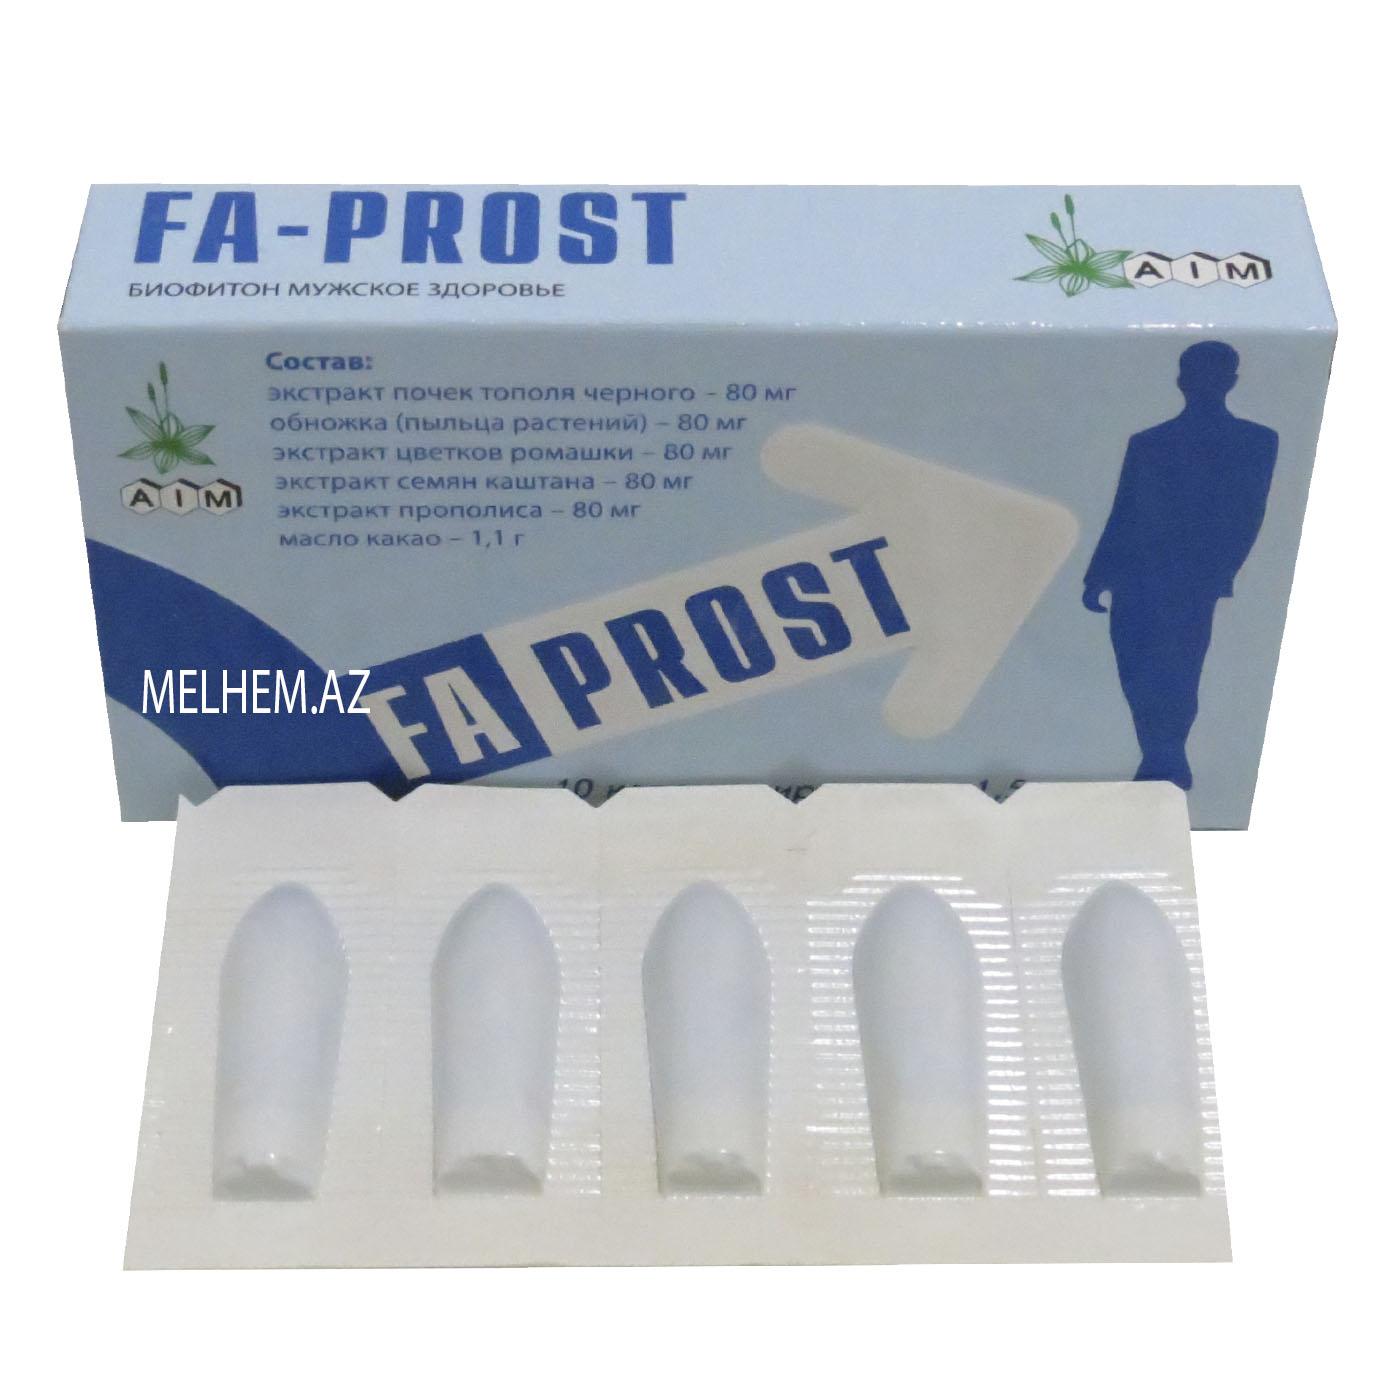 FA-PROST